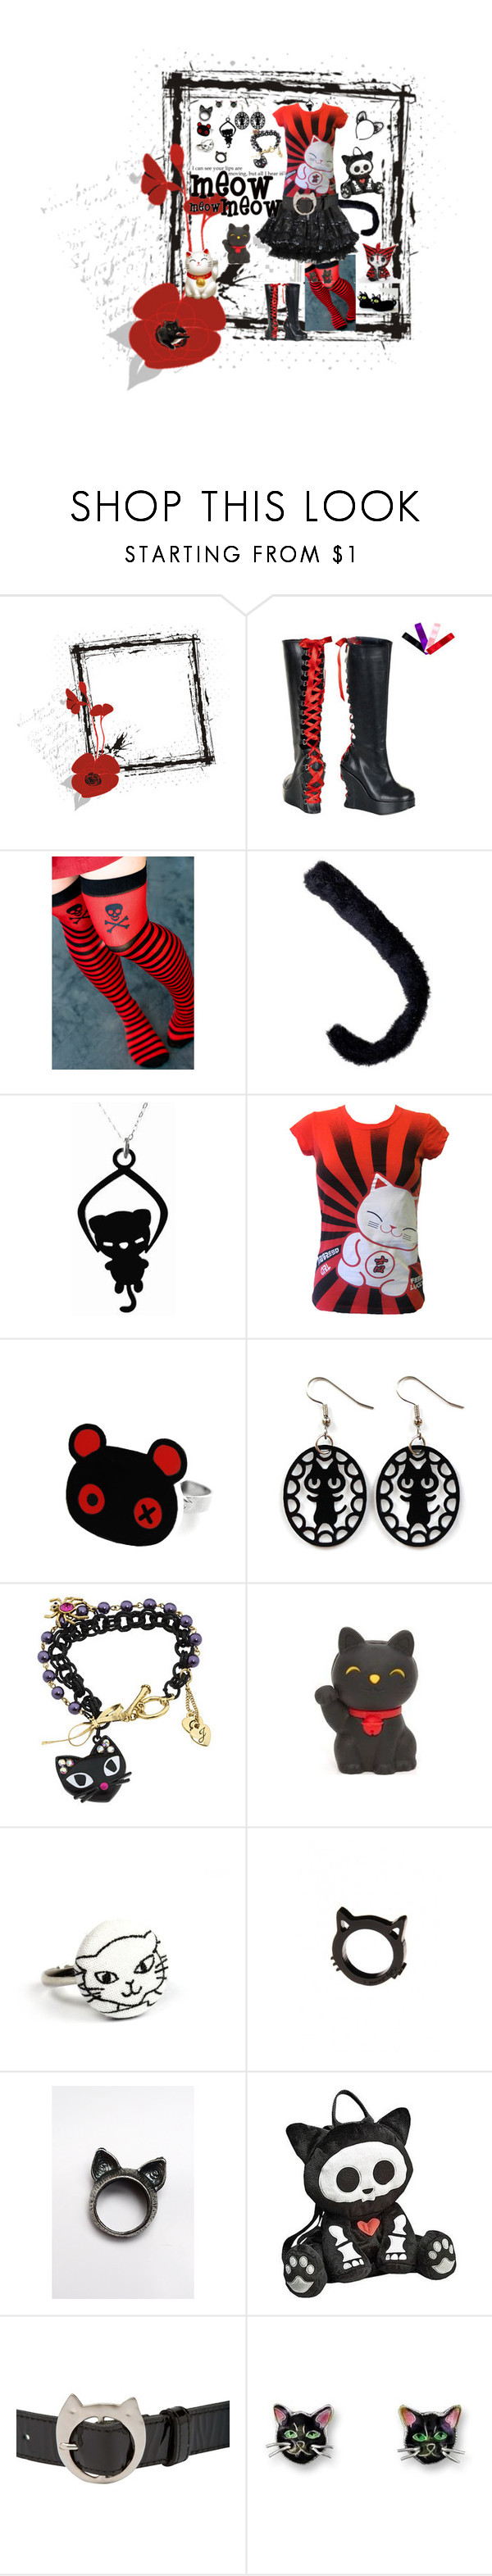 """The Cat's Meow"" by mysticrose29 ❤ liked on Polyvore featuring INC International Concepts, Newbreed Girl, Panda, Betsey Johnson, FluffsStuffs, Tsumori Chisato, kitten, cat, goth and neko"